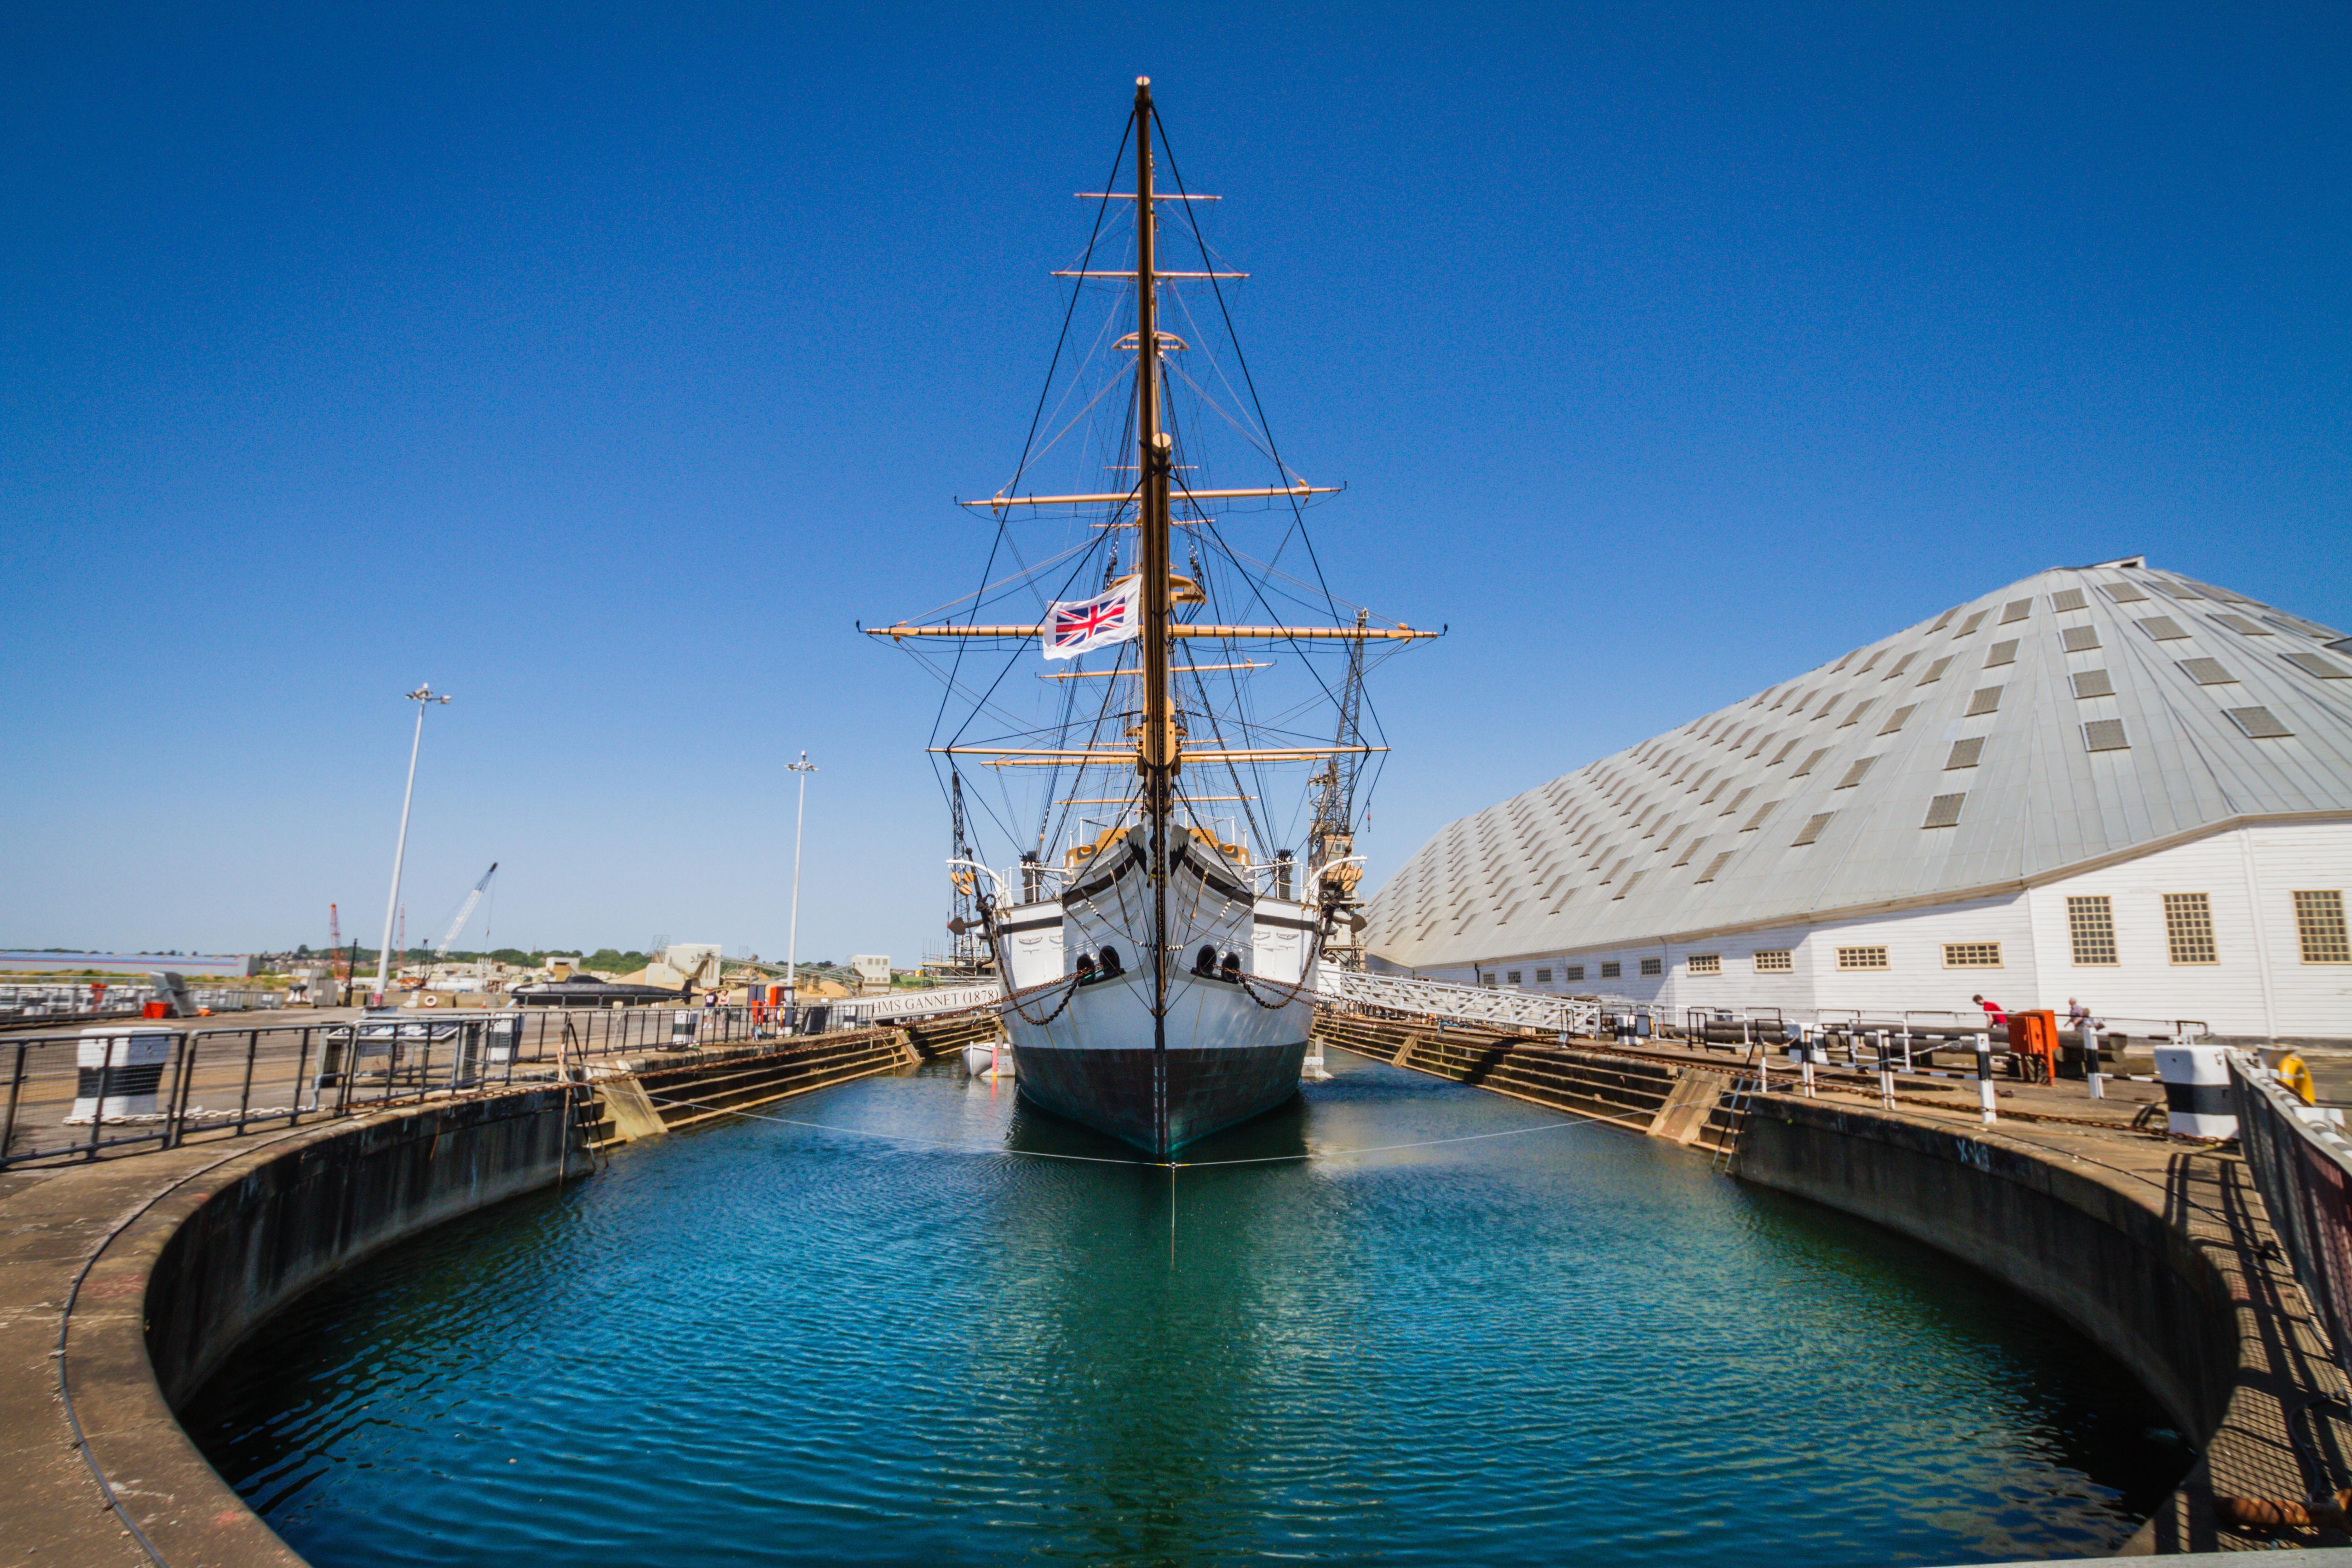 HMS_Gannet_Chatham_Historic_Dockyard